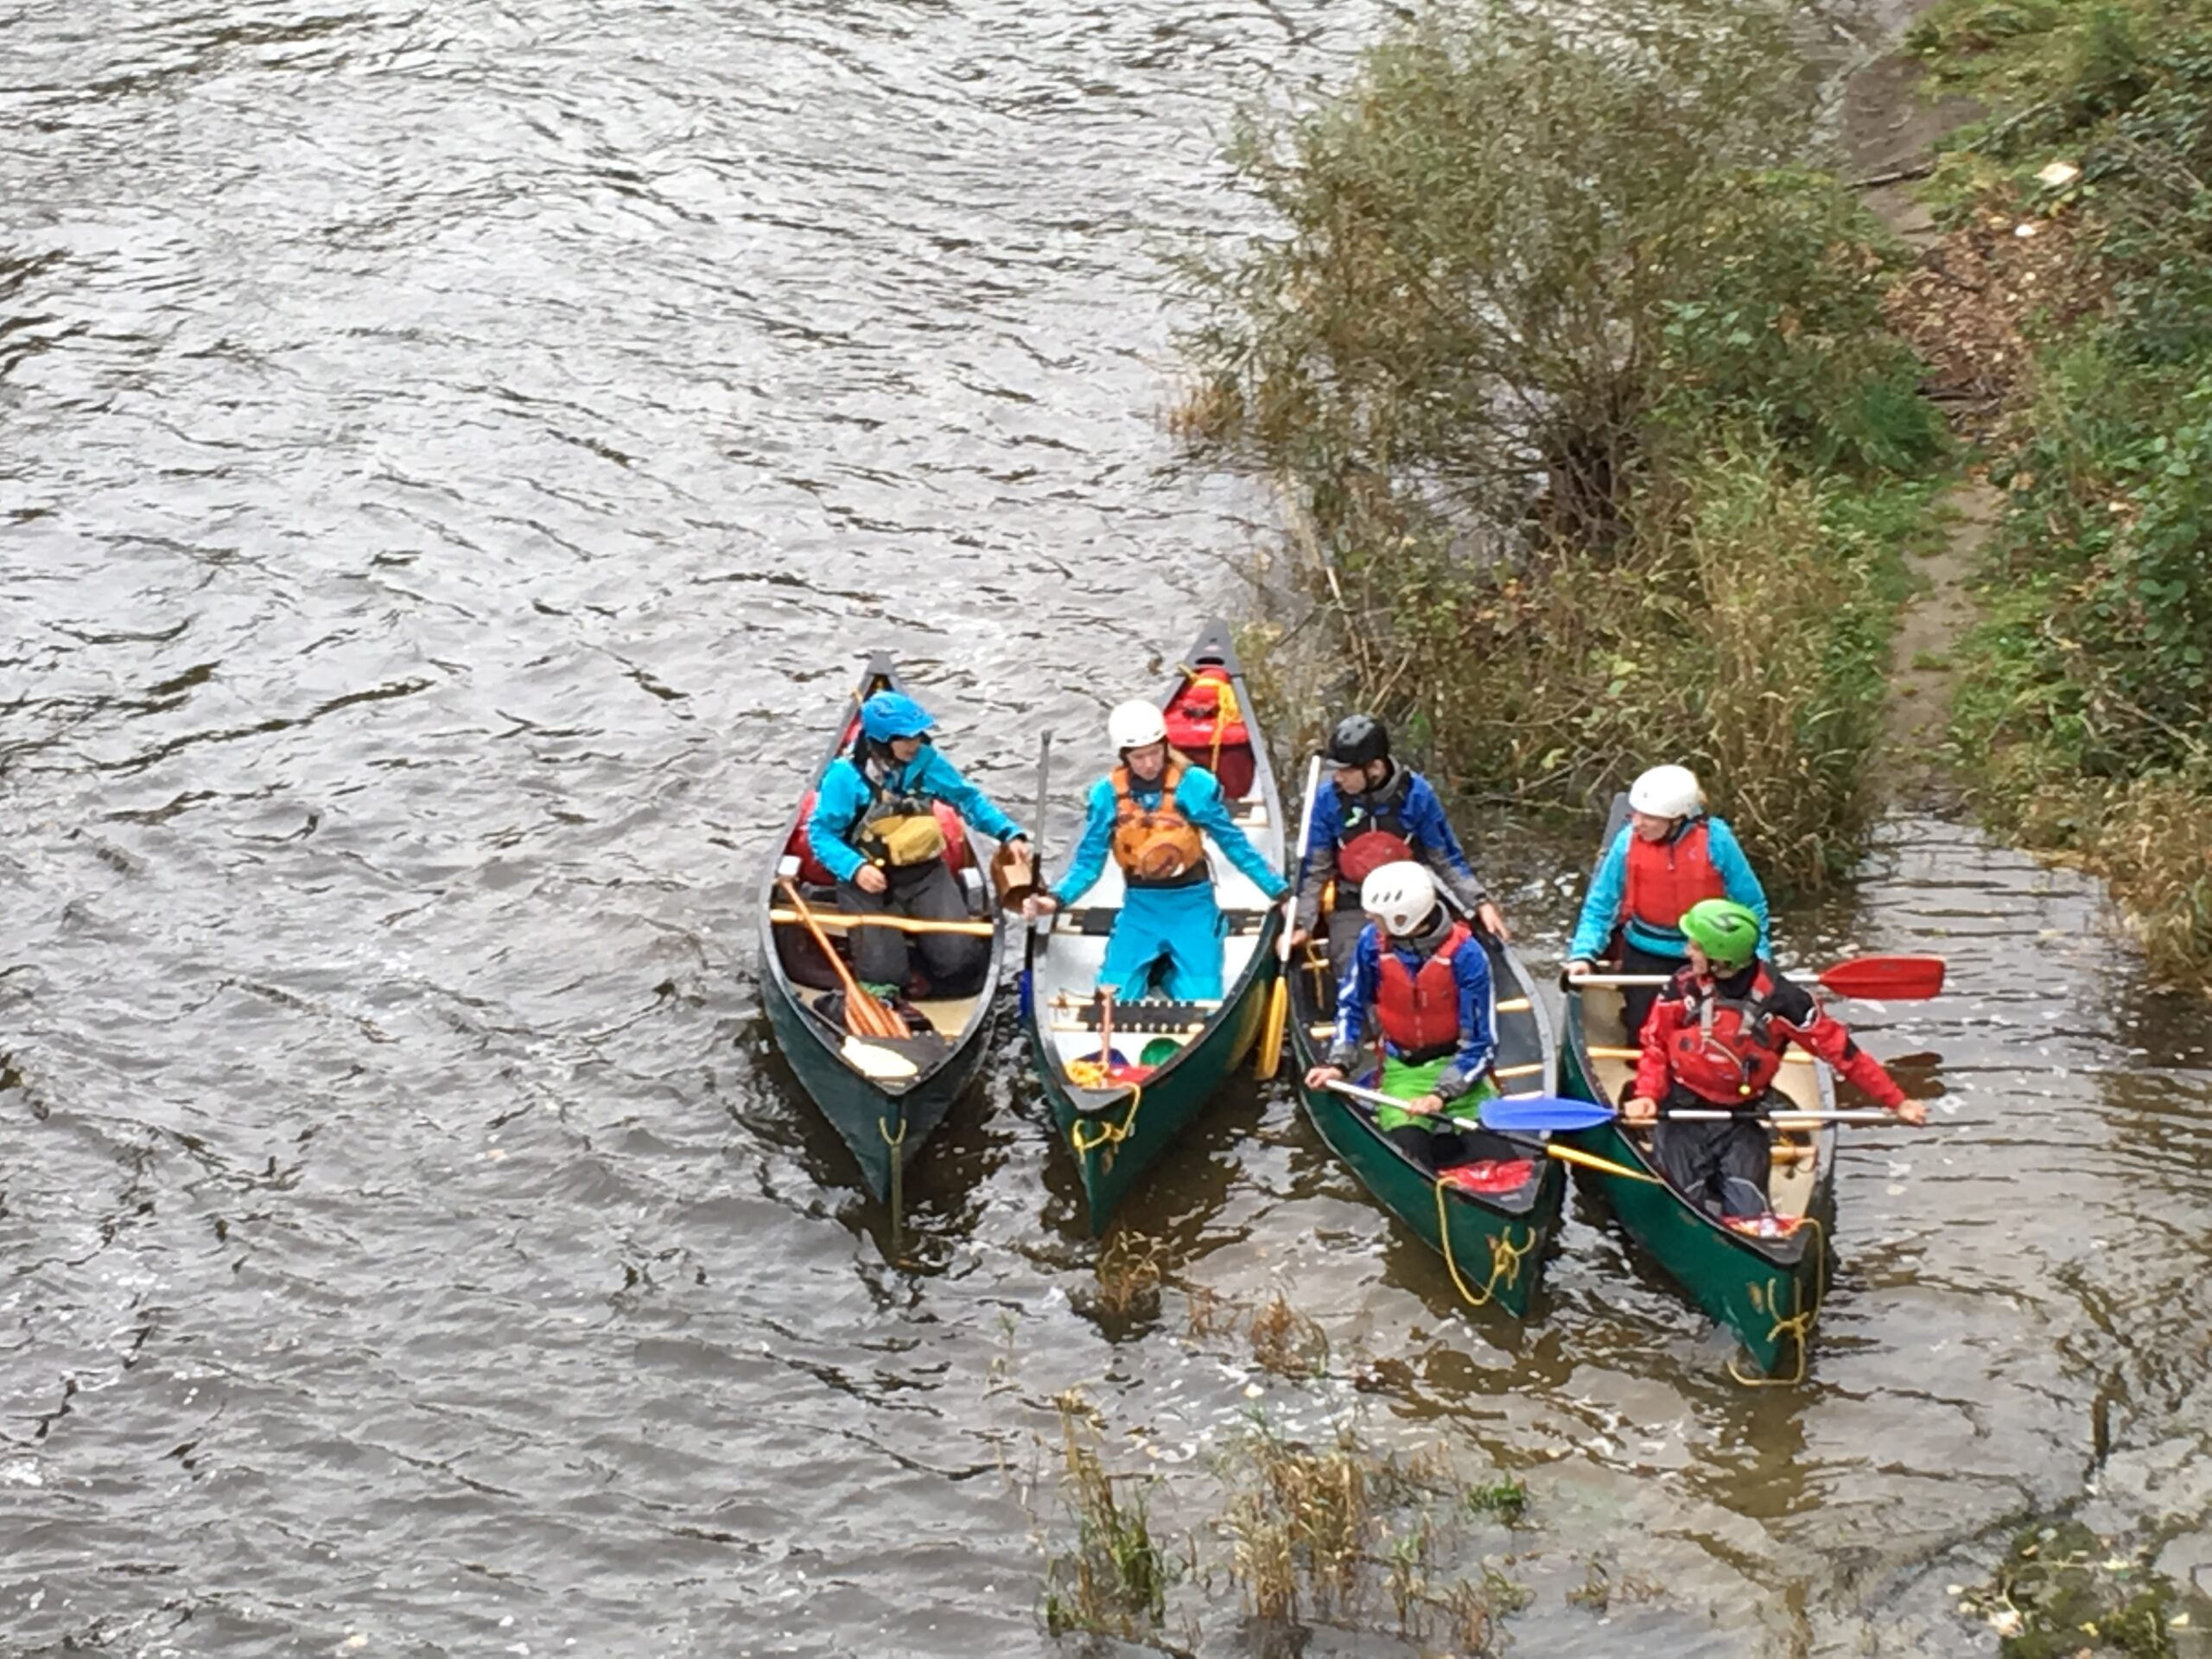 Canoe COaching on the Severn